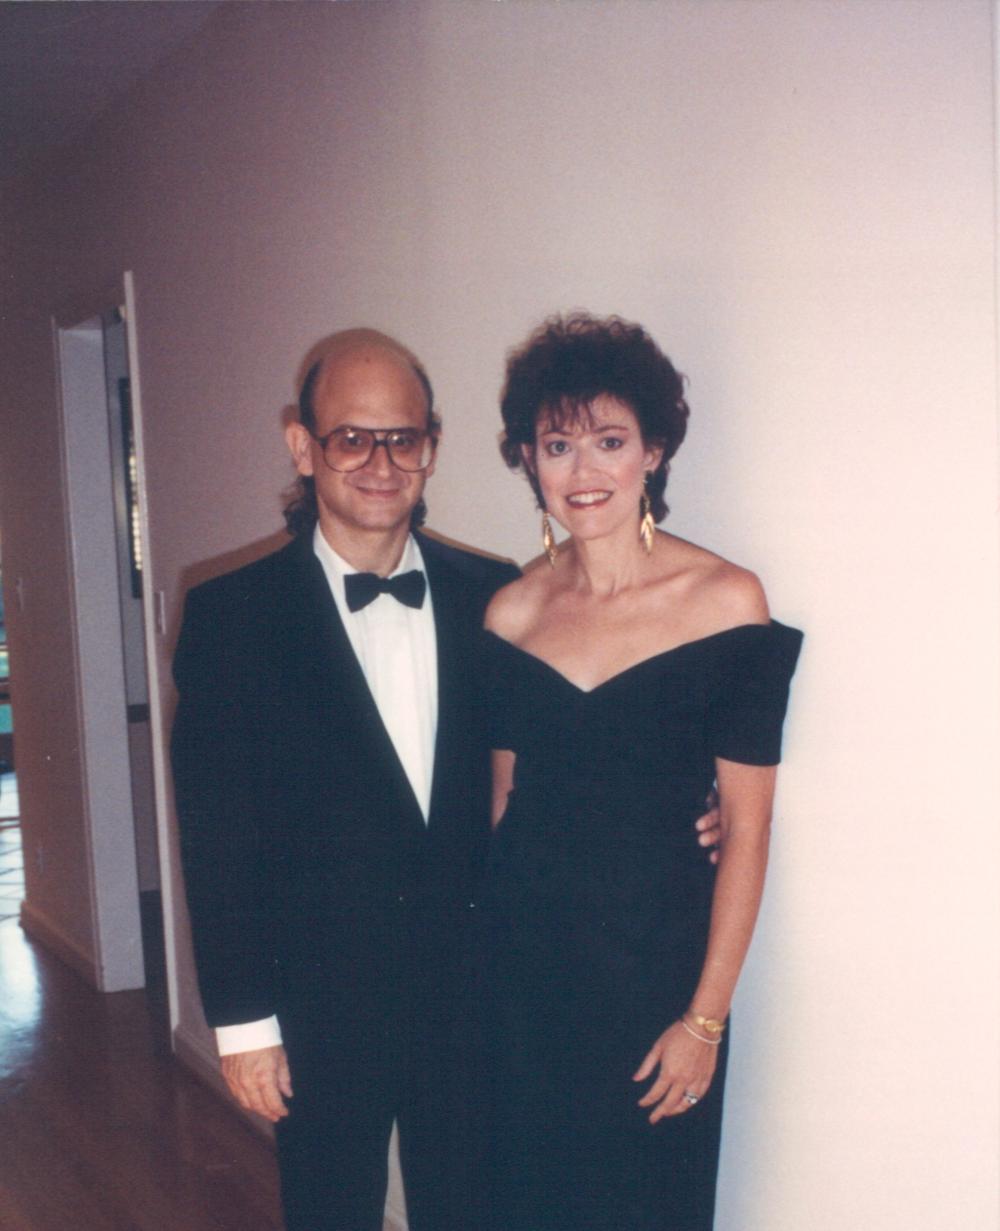 Bonnie & David Frank, 1st EMMY nomination, 1990